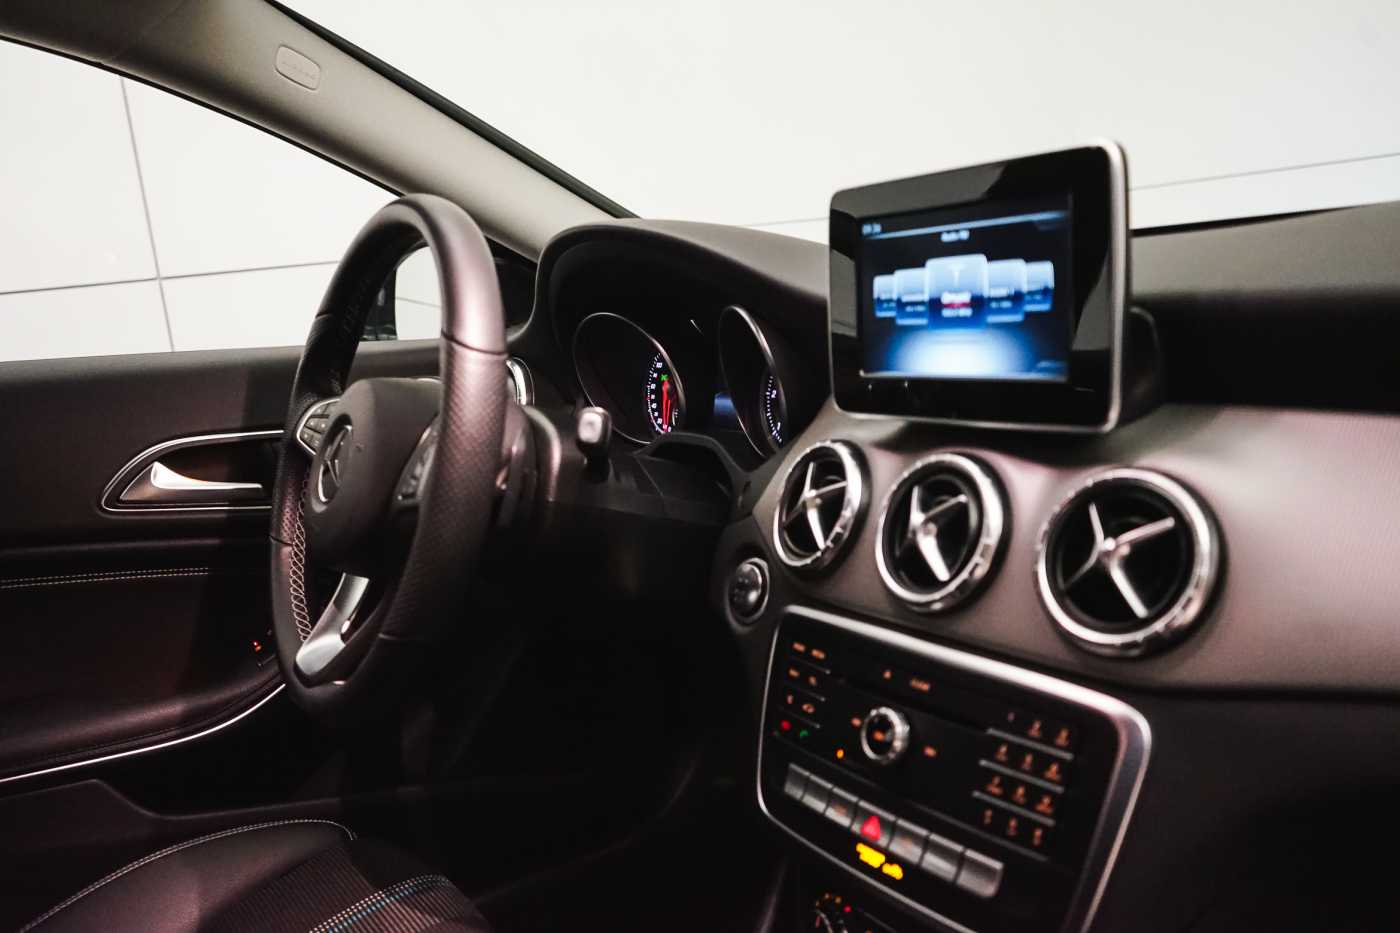 Mercedes CLA 200 d //Camera, Airco, Navi 12/33